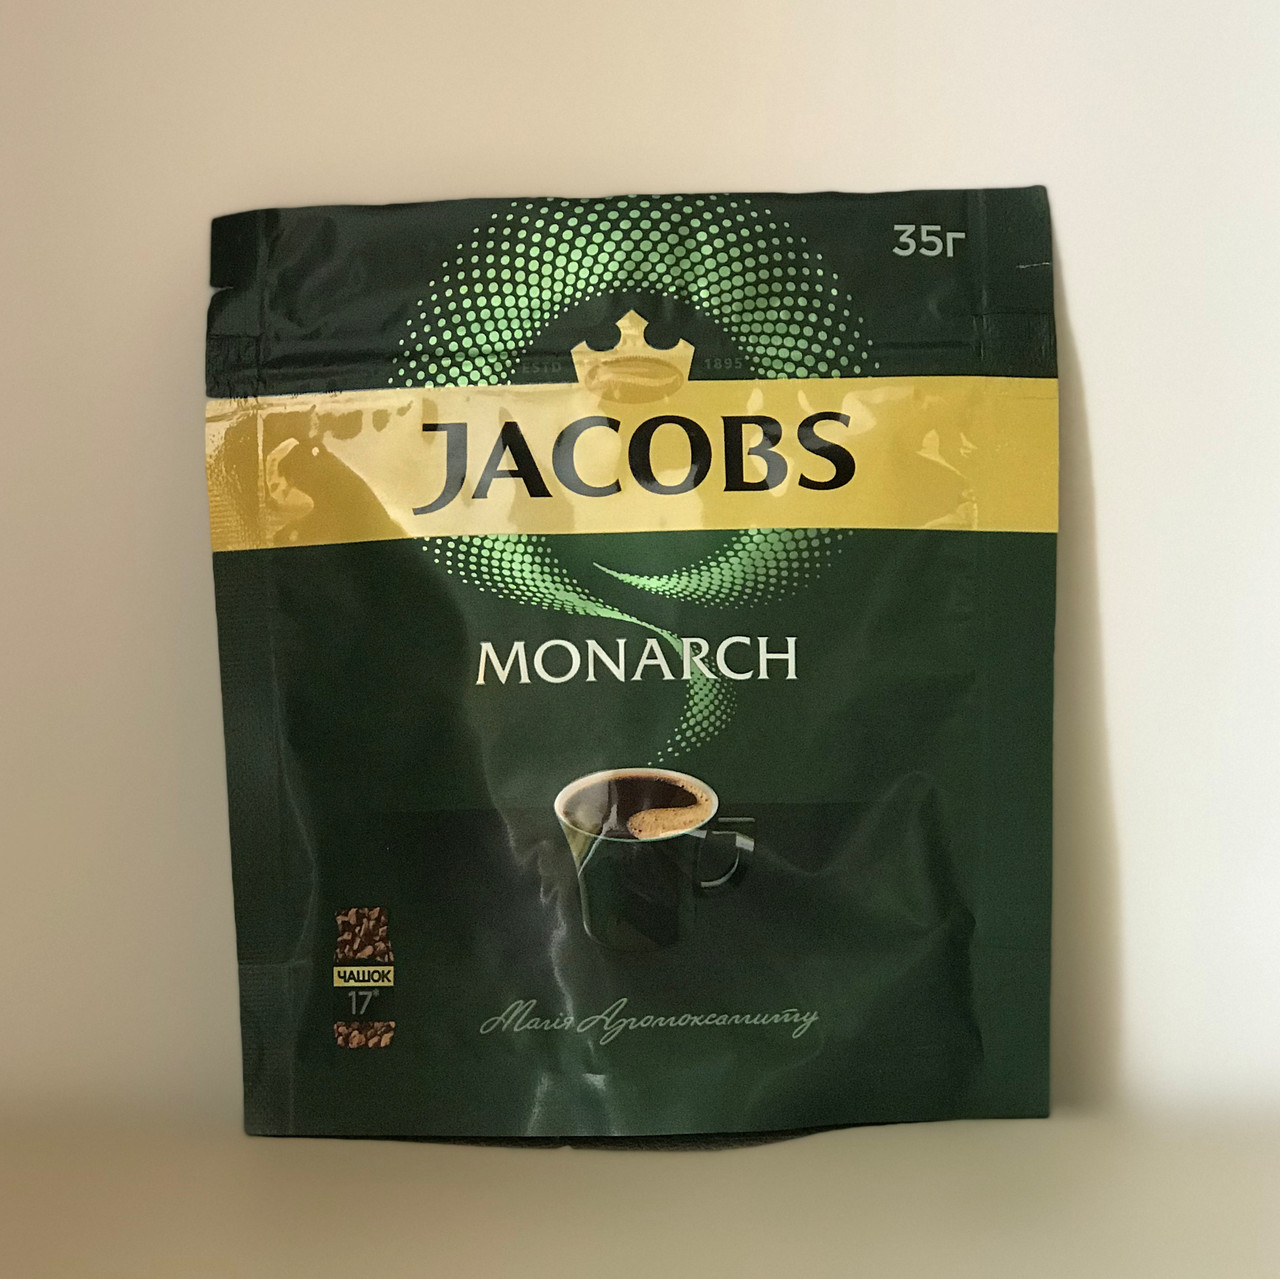 Кофе Jacobs Monarch 35 грамм (Германия)